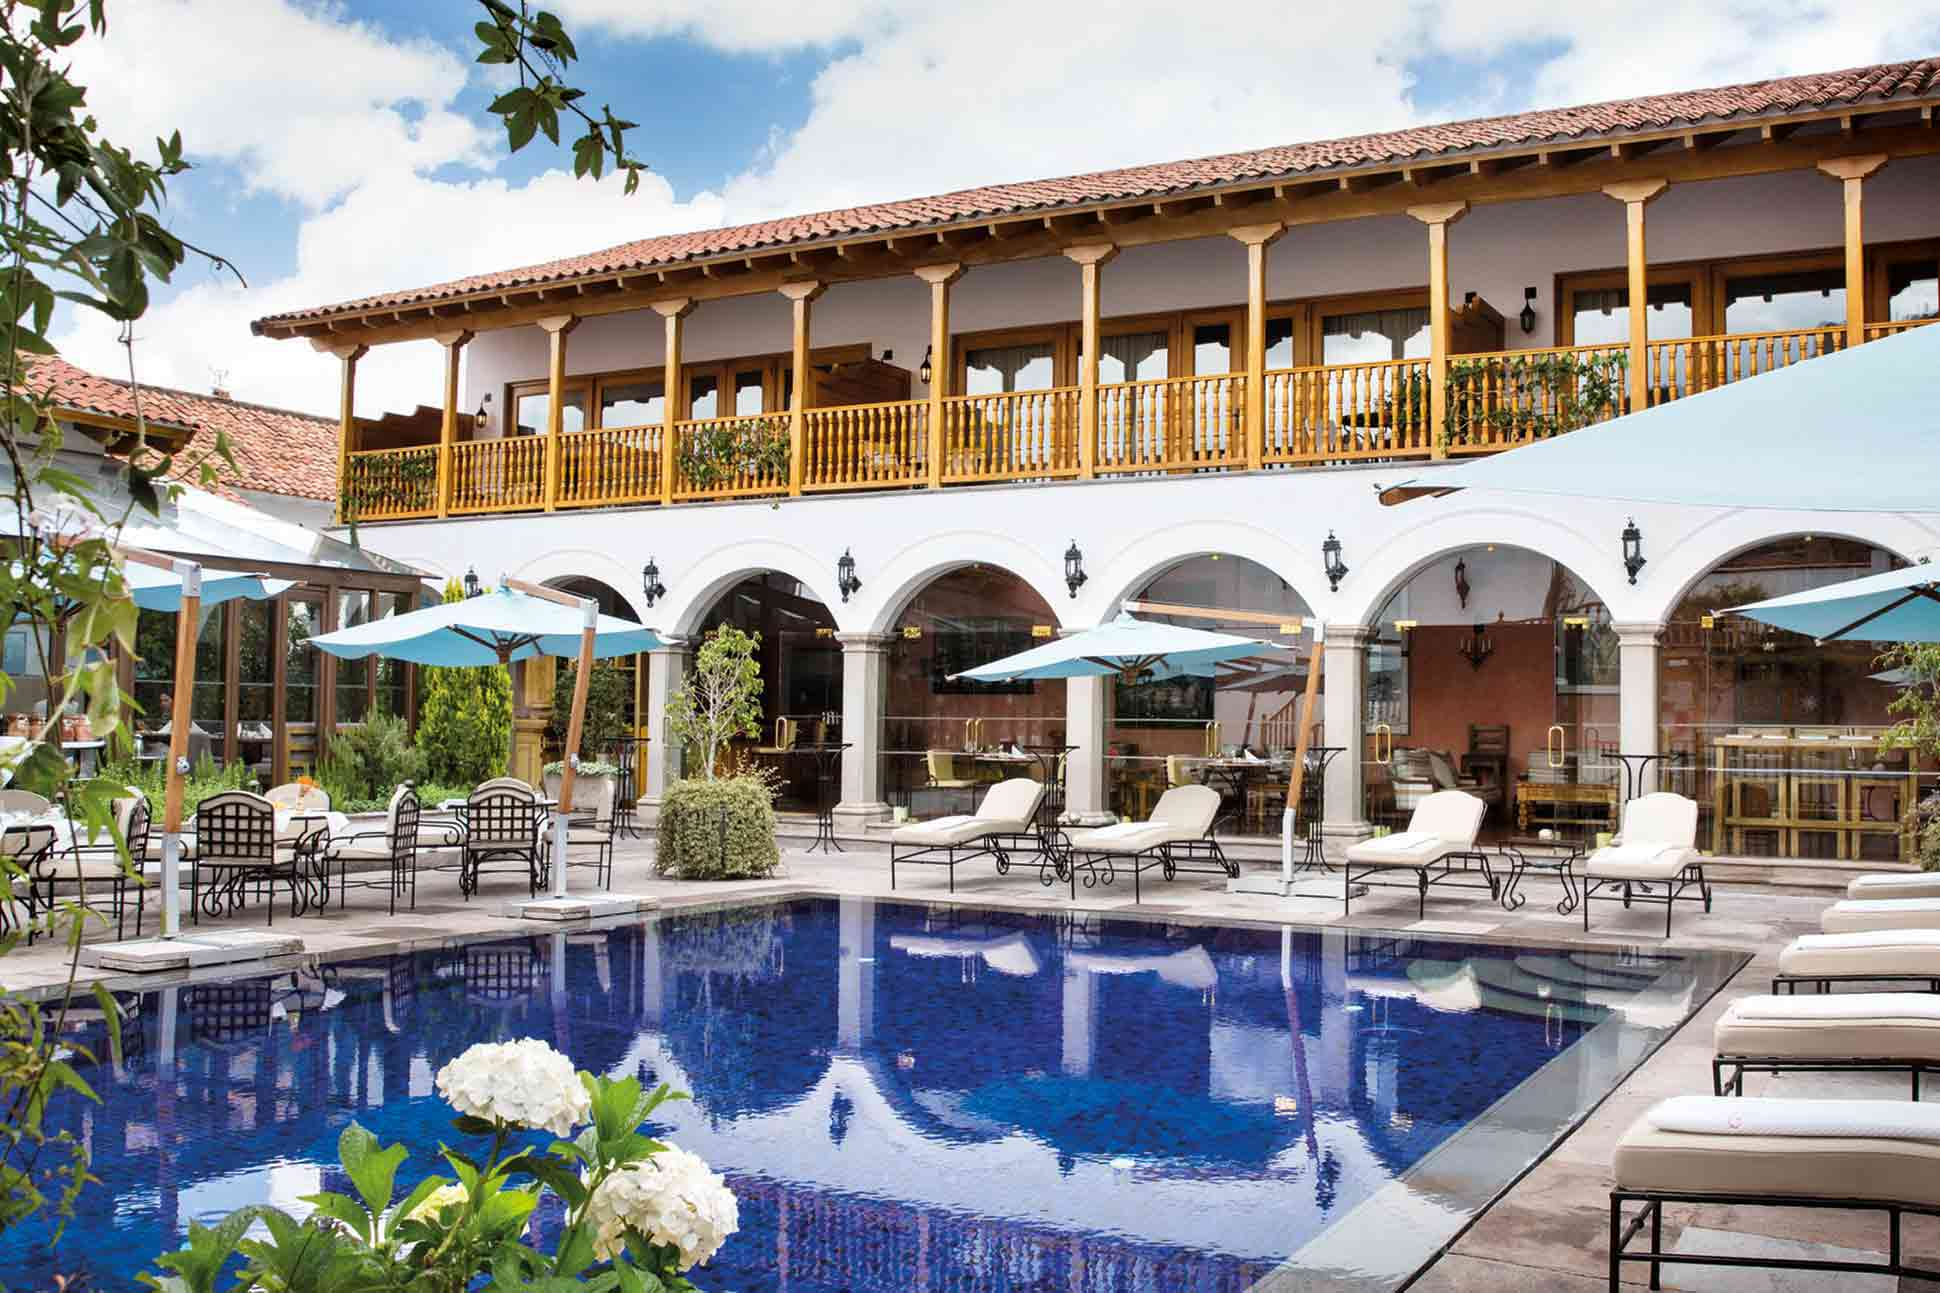 Belmond Palacio Nazarenas <br>Cusco, Peru